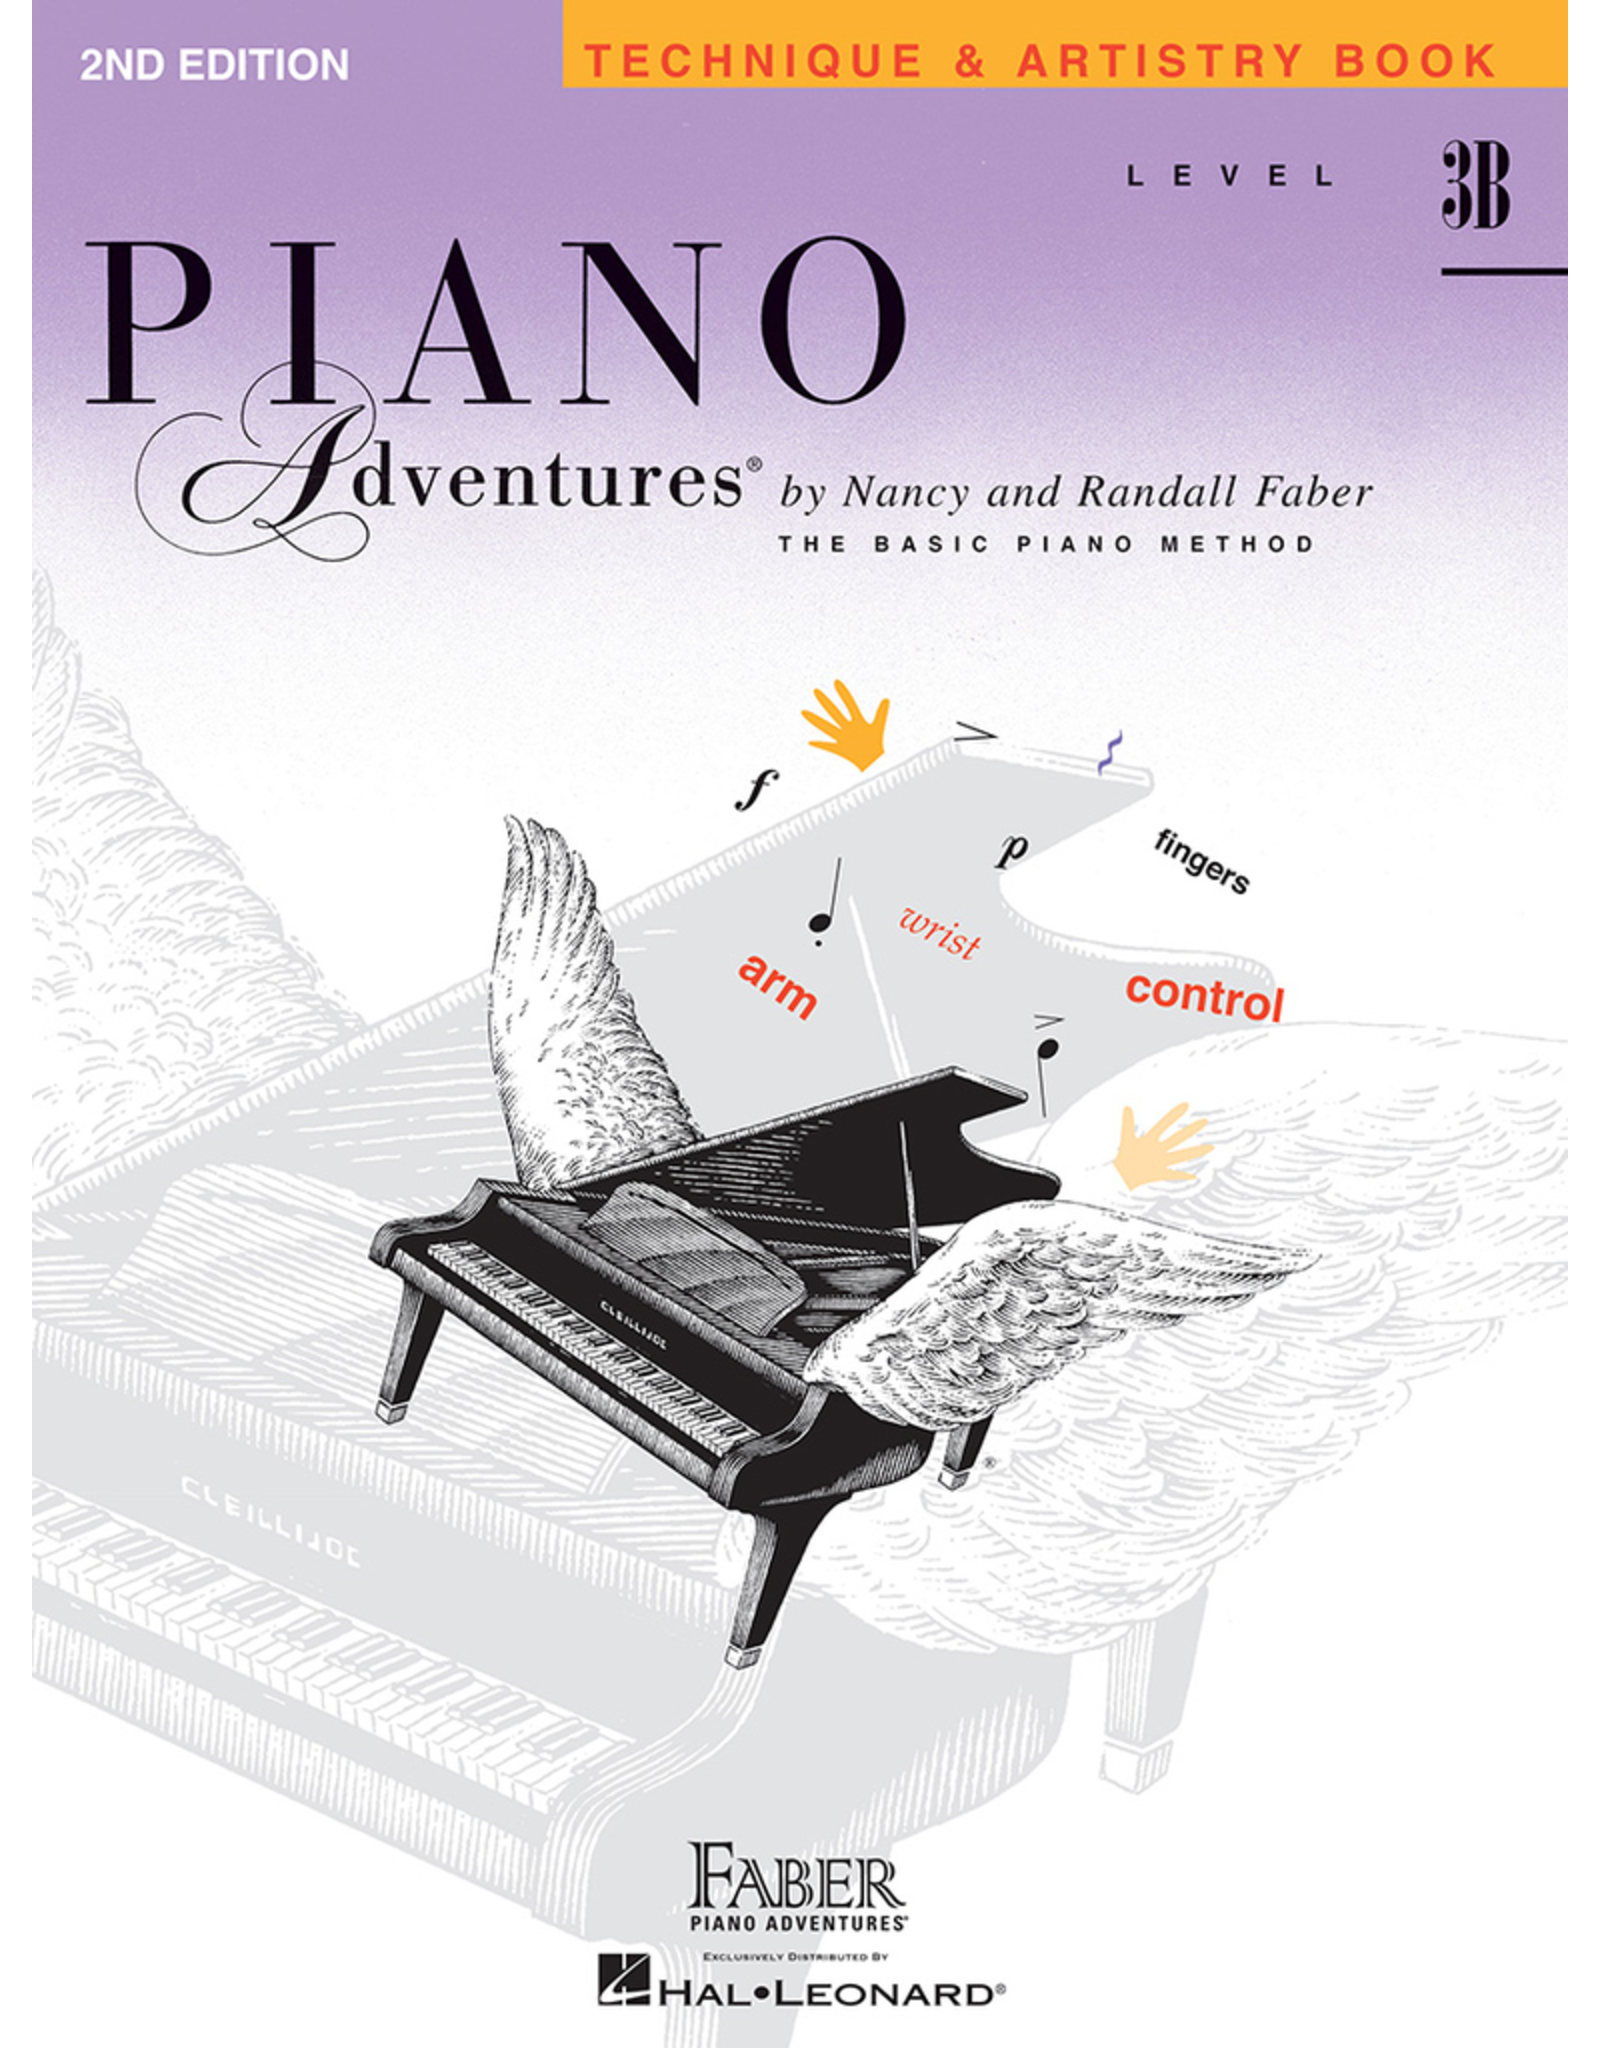 Hal Leonard Piano Adventures Technique & Artistry level 3B *